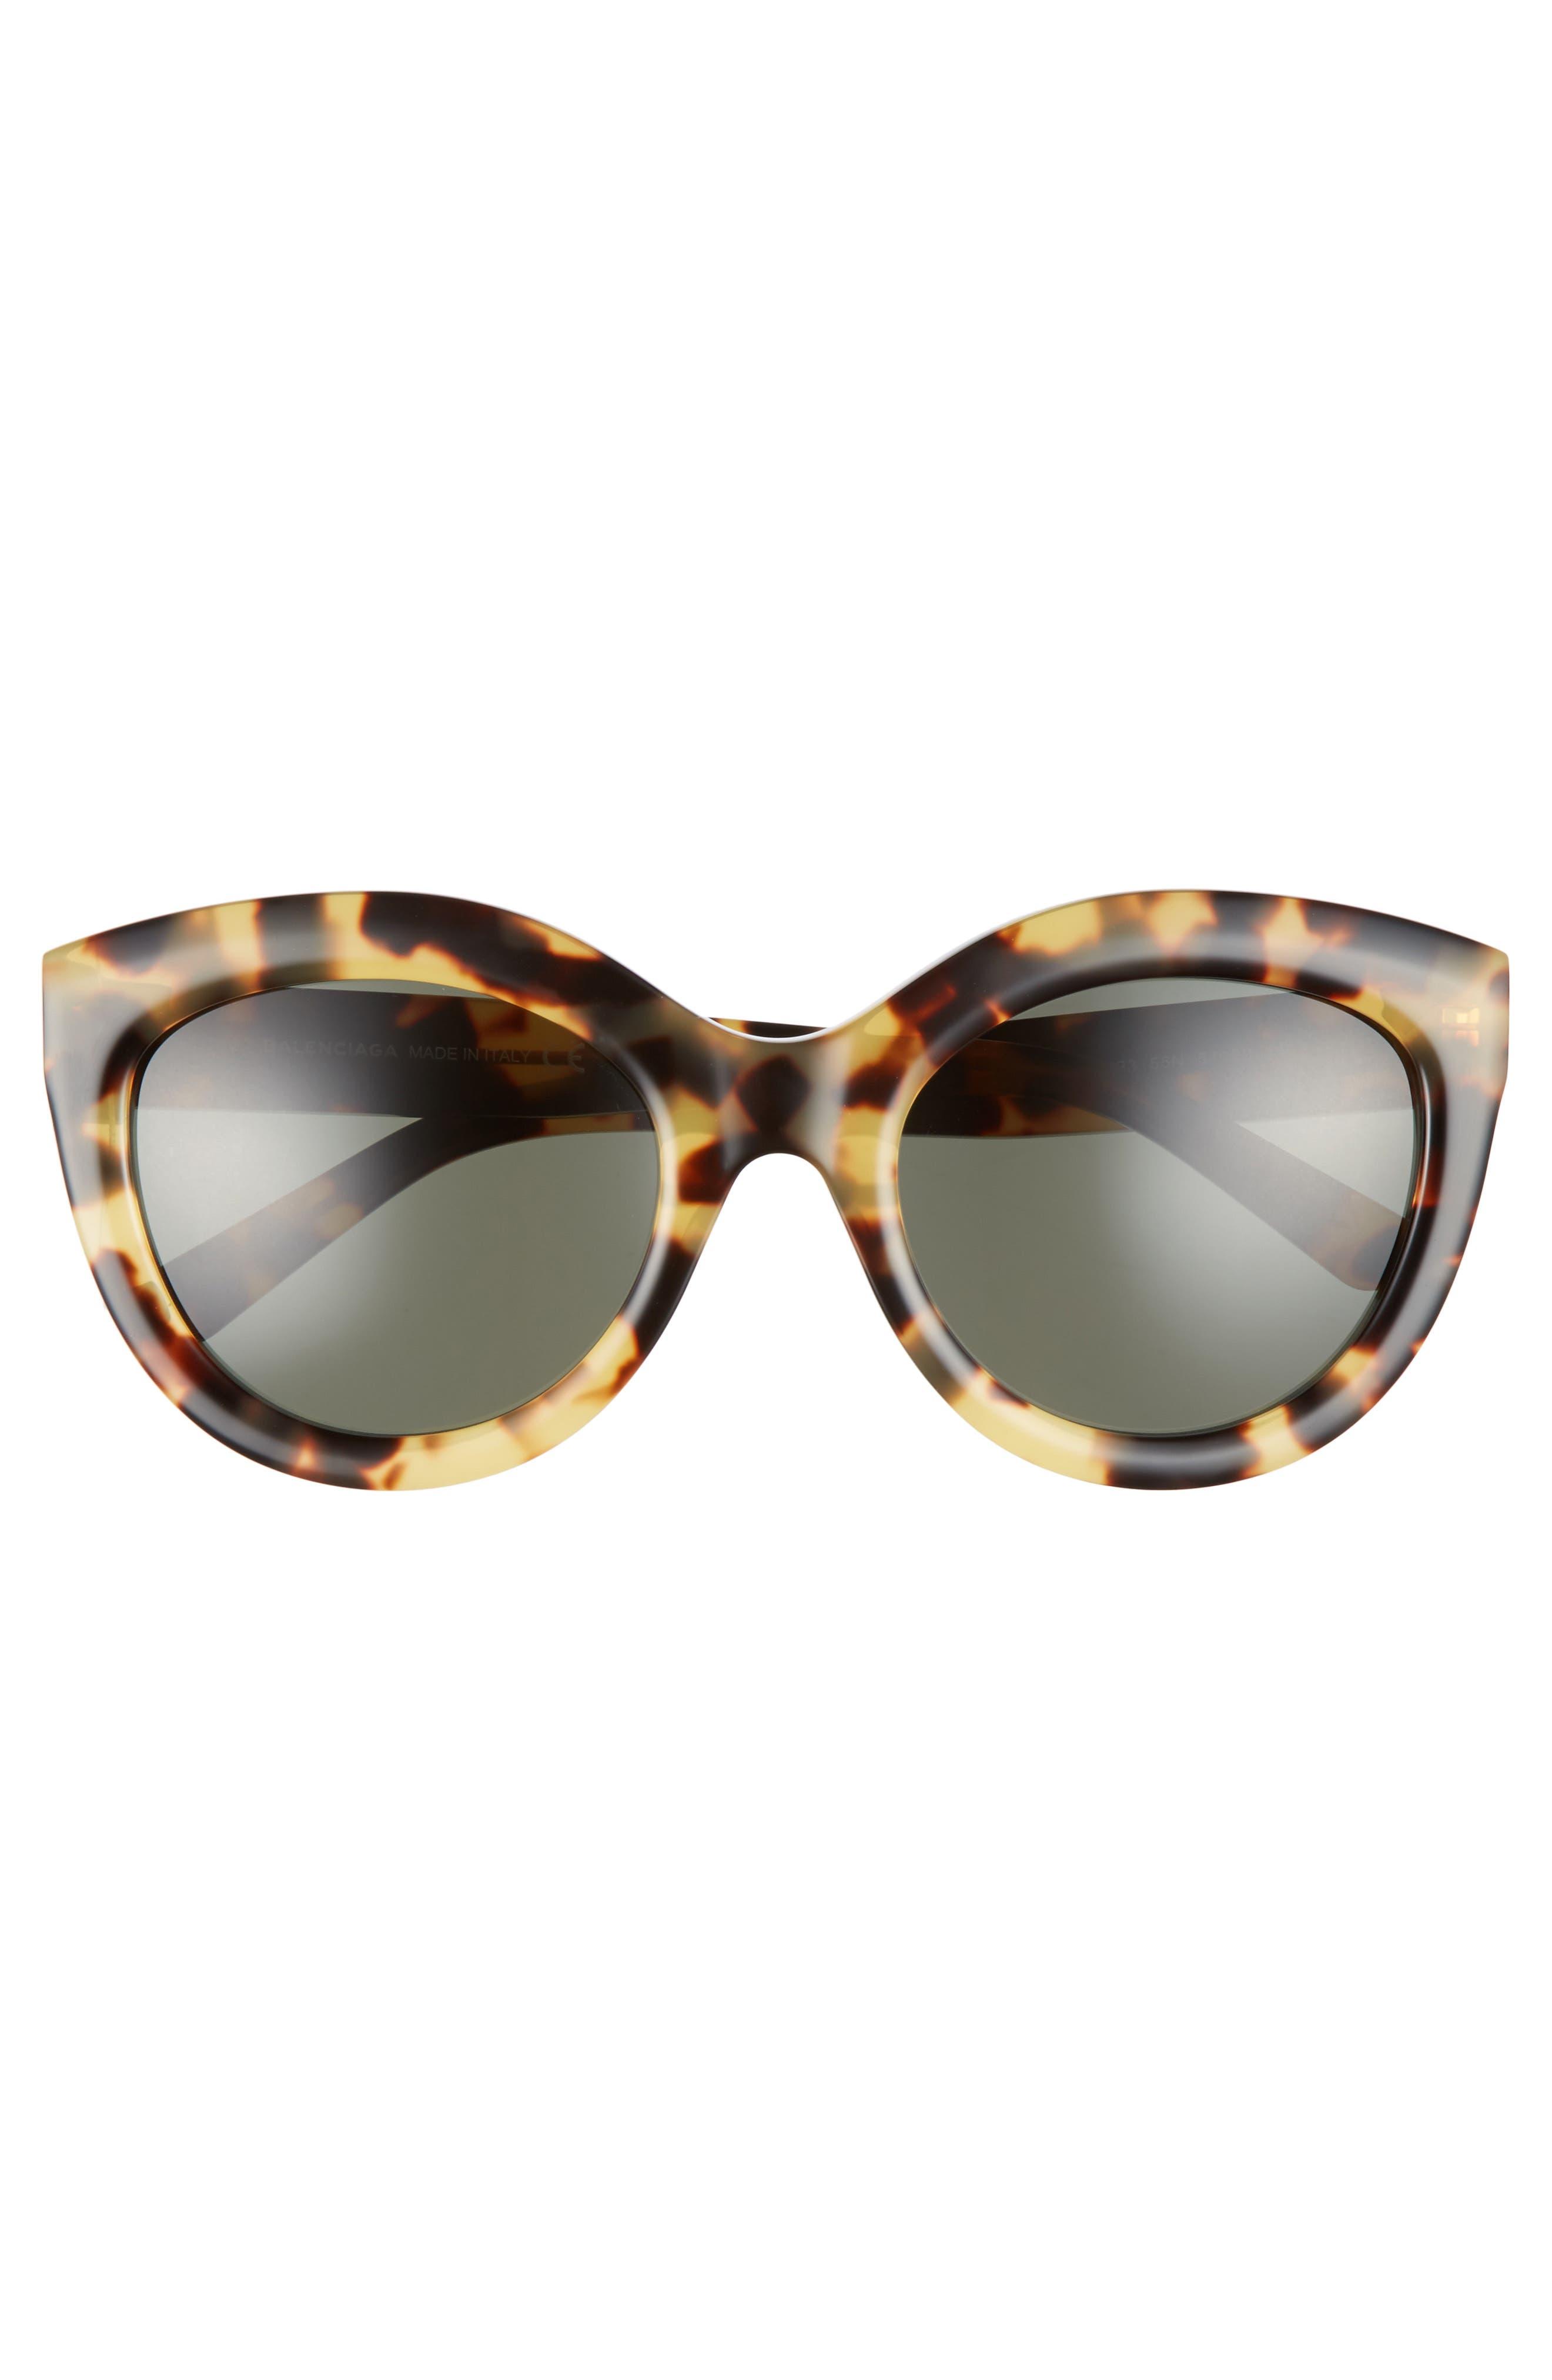 54mm Cat Eye Sunglasses,                             Alternate thumbnail 3, color,                             200